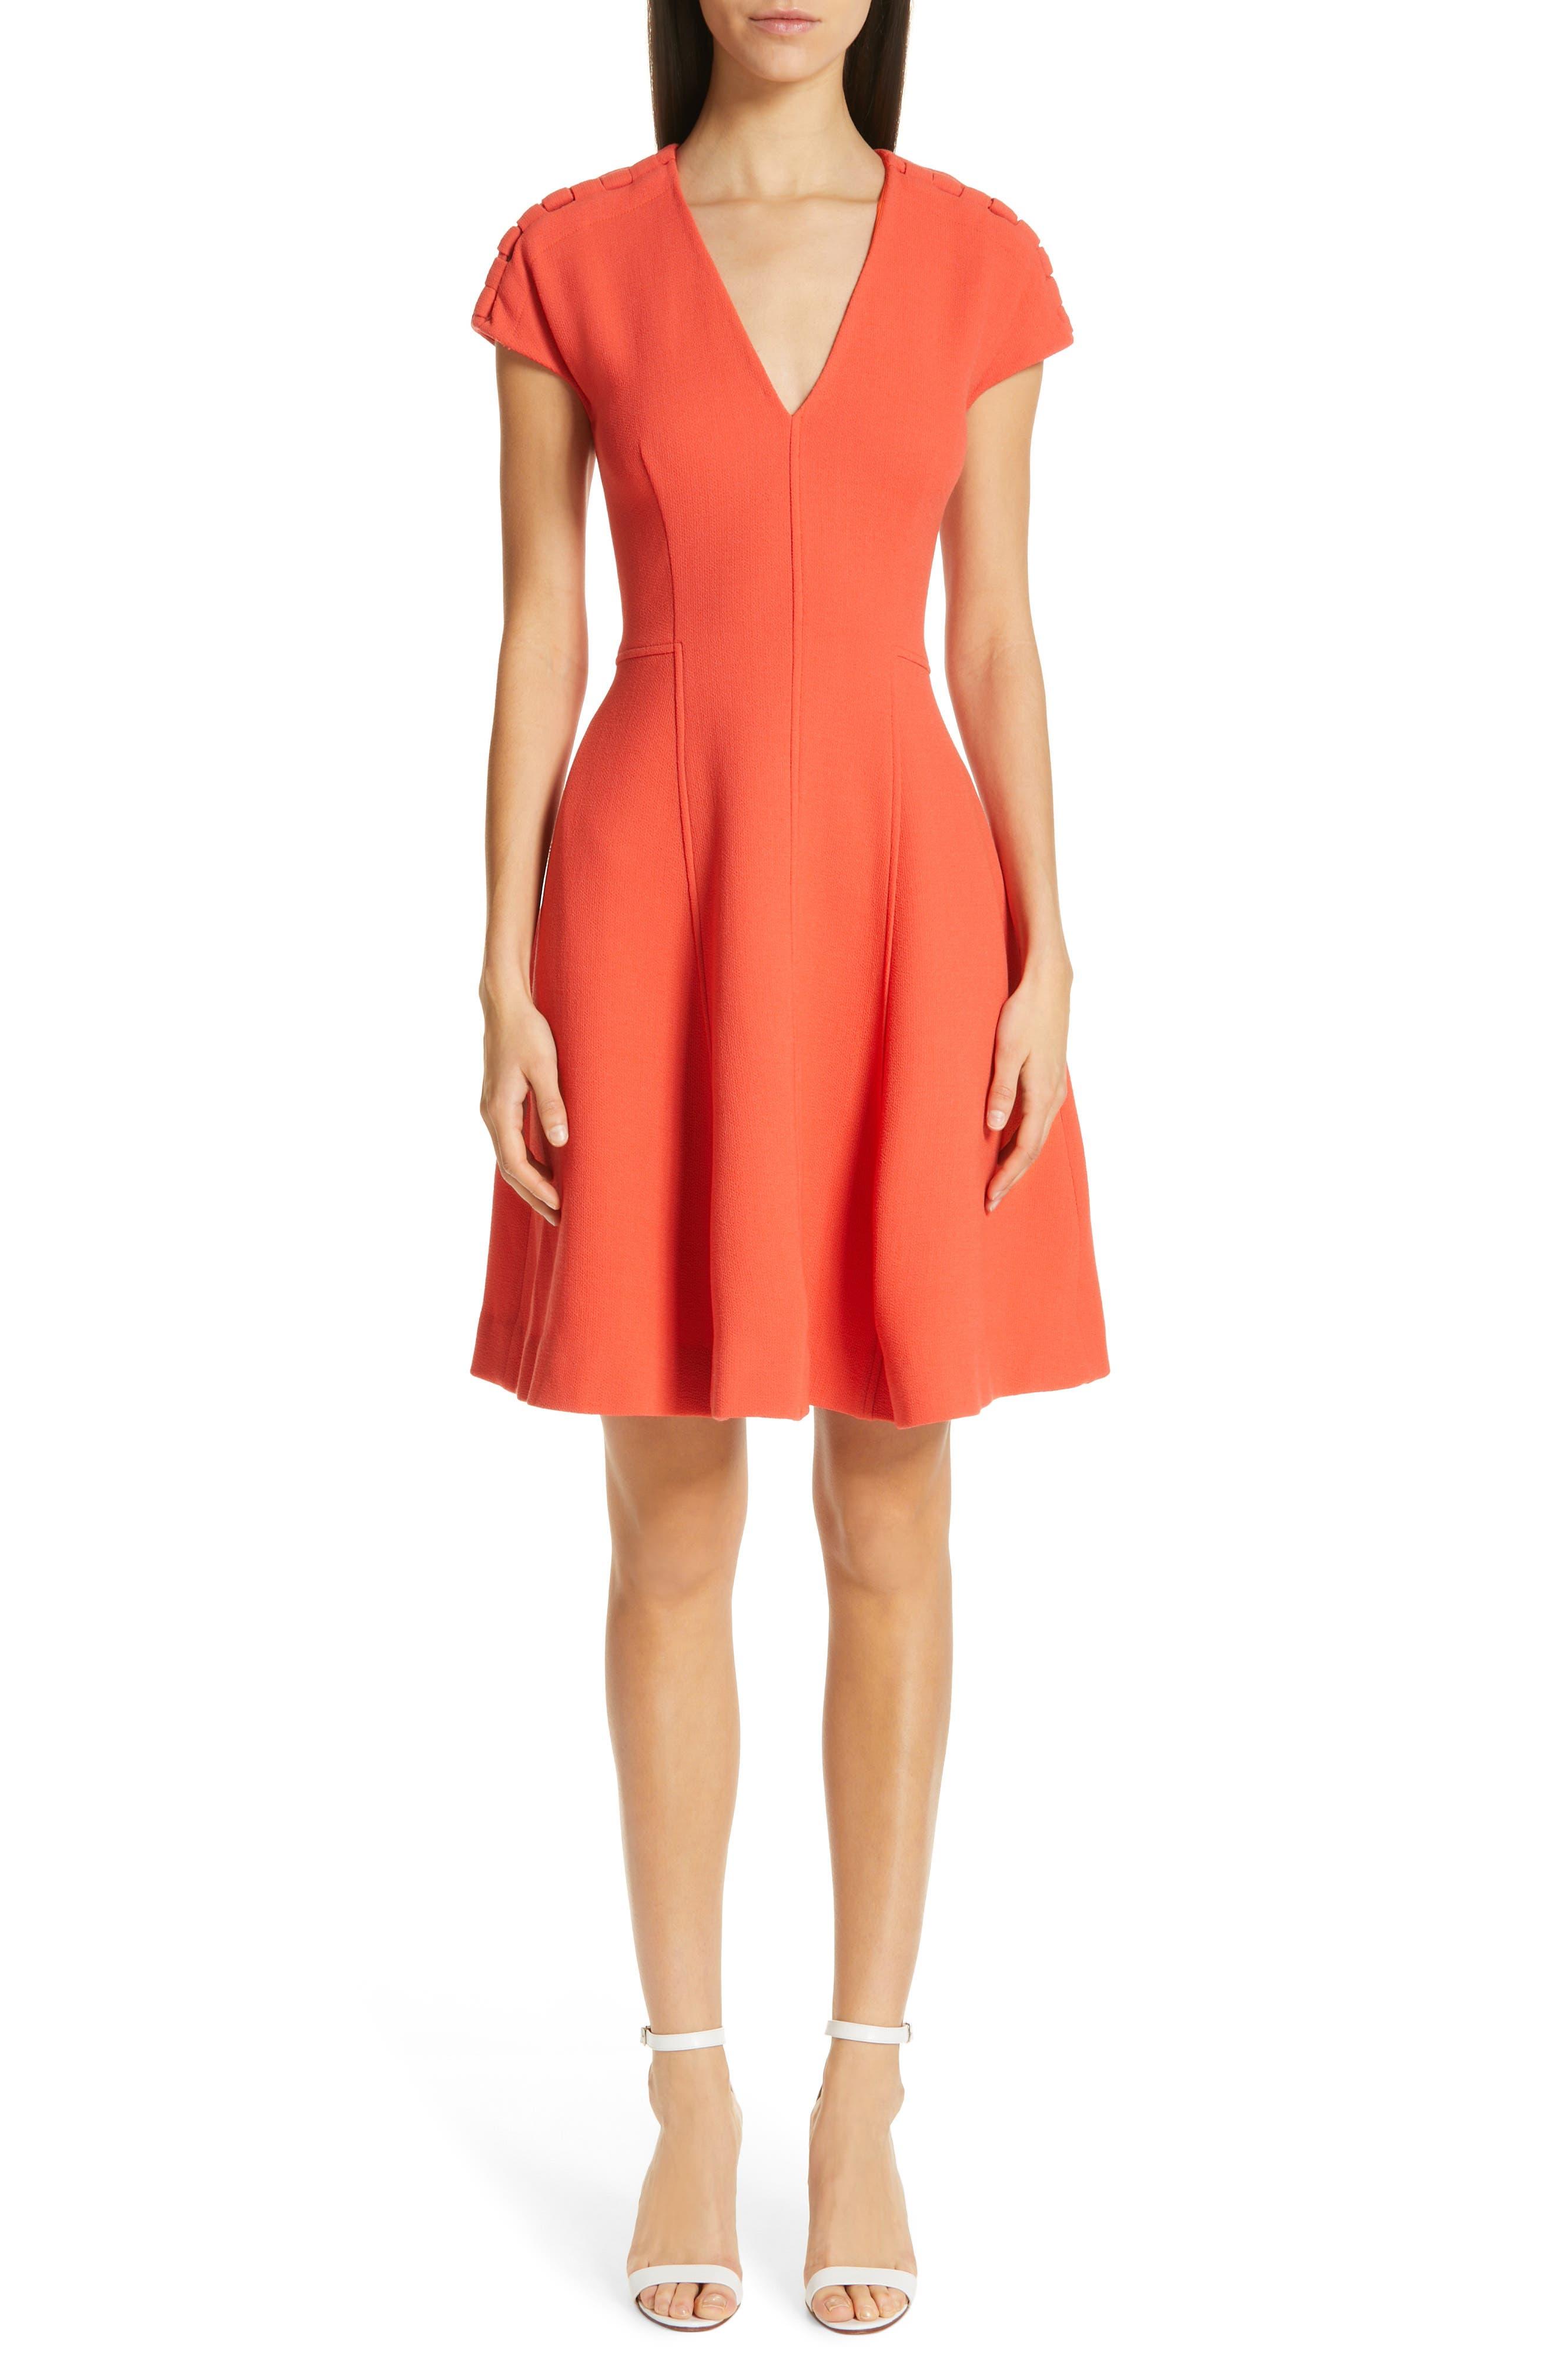 Lela Rose Seamed Wool Blend Crepe Dress, Coral